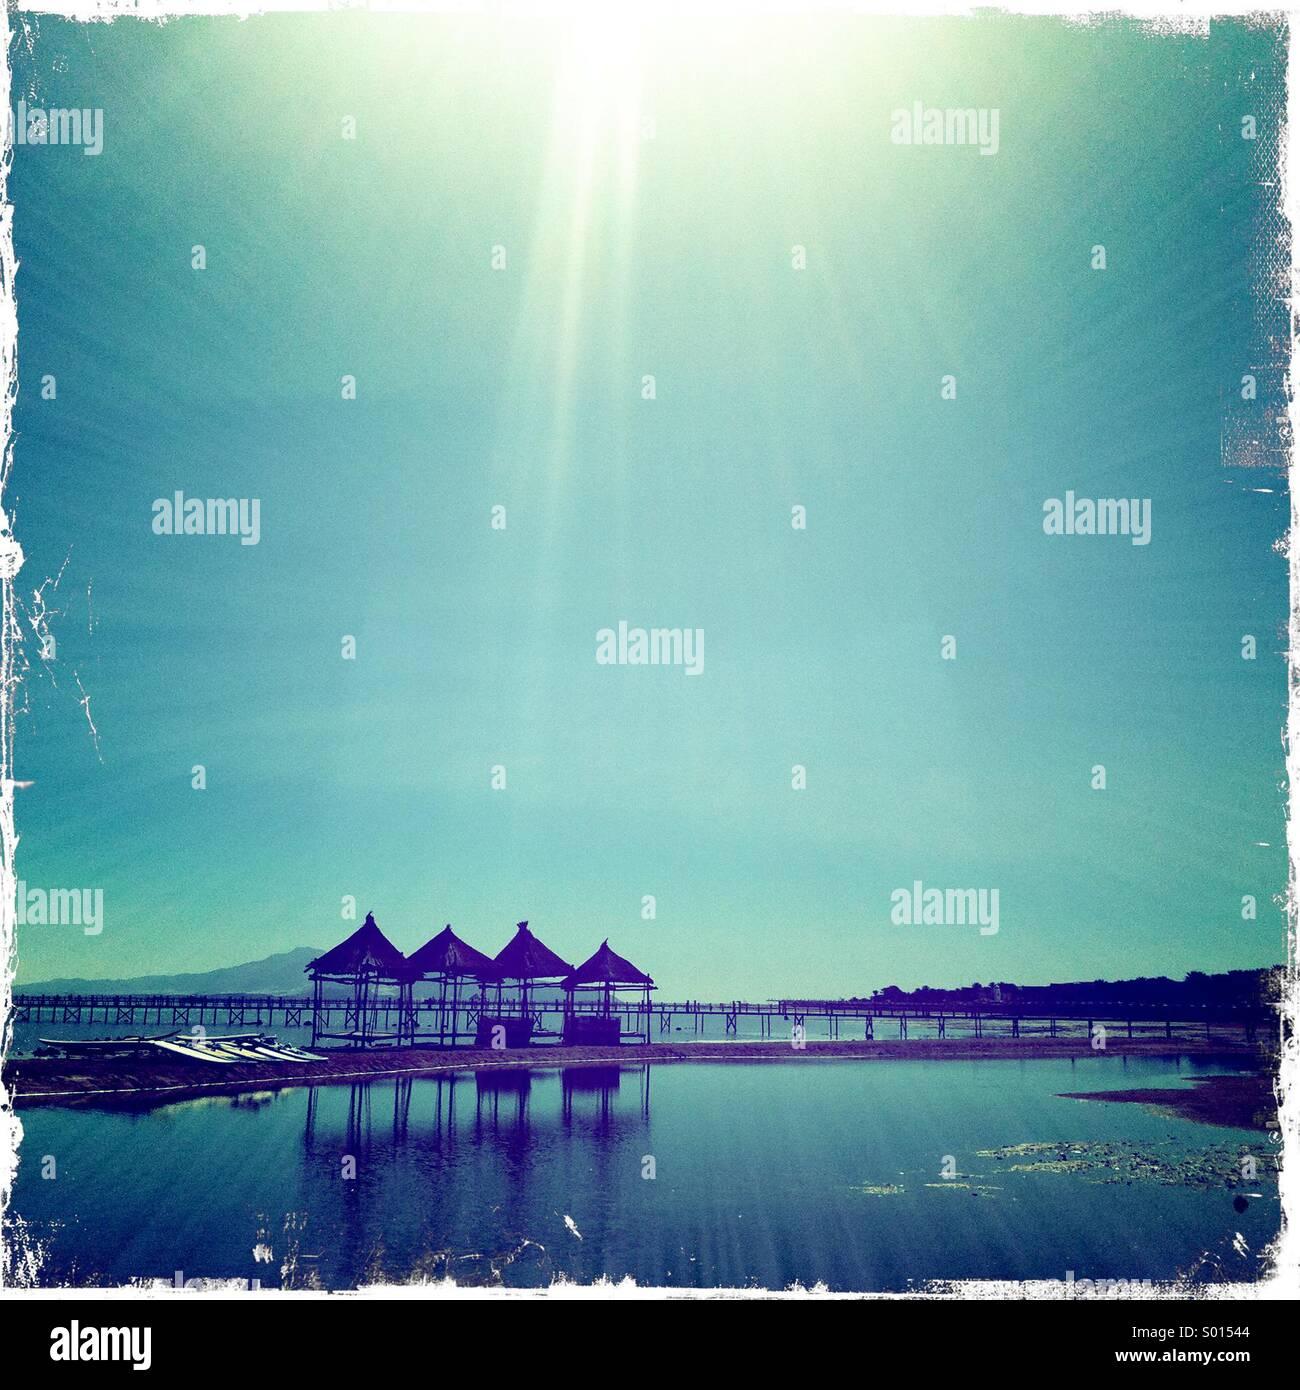 egyptian-beach-with-sun-lounger-hut-S015